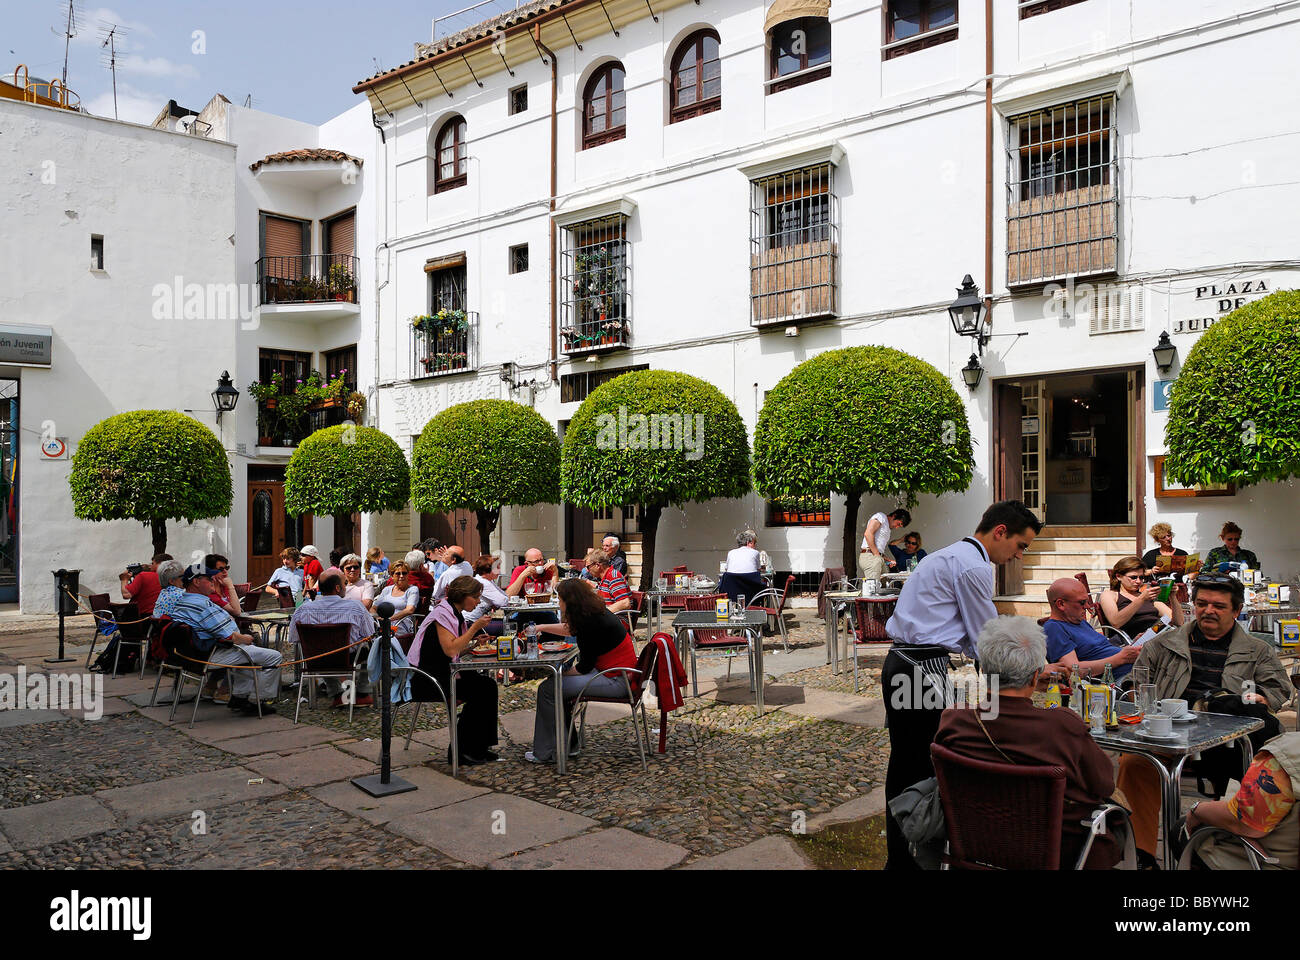 Juderia, the former Jewish quarter, Cordoba, Andalusia, Spain, Europe Stock P...